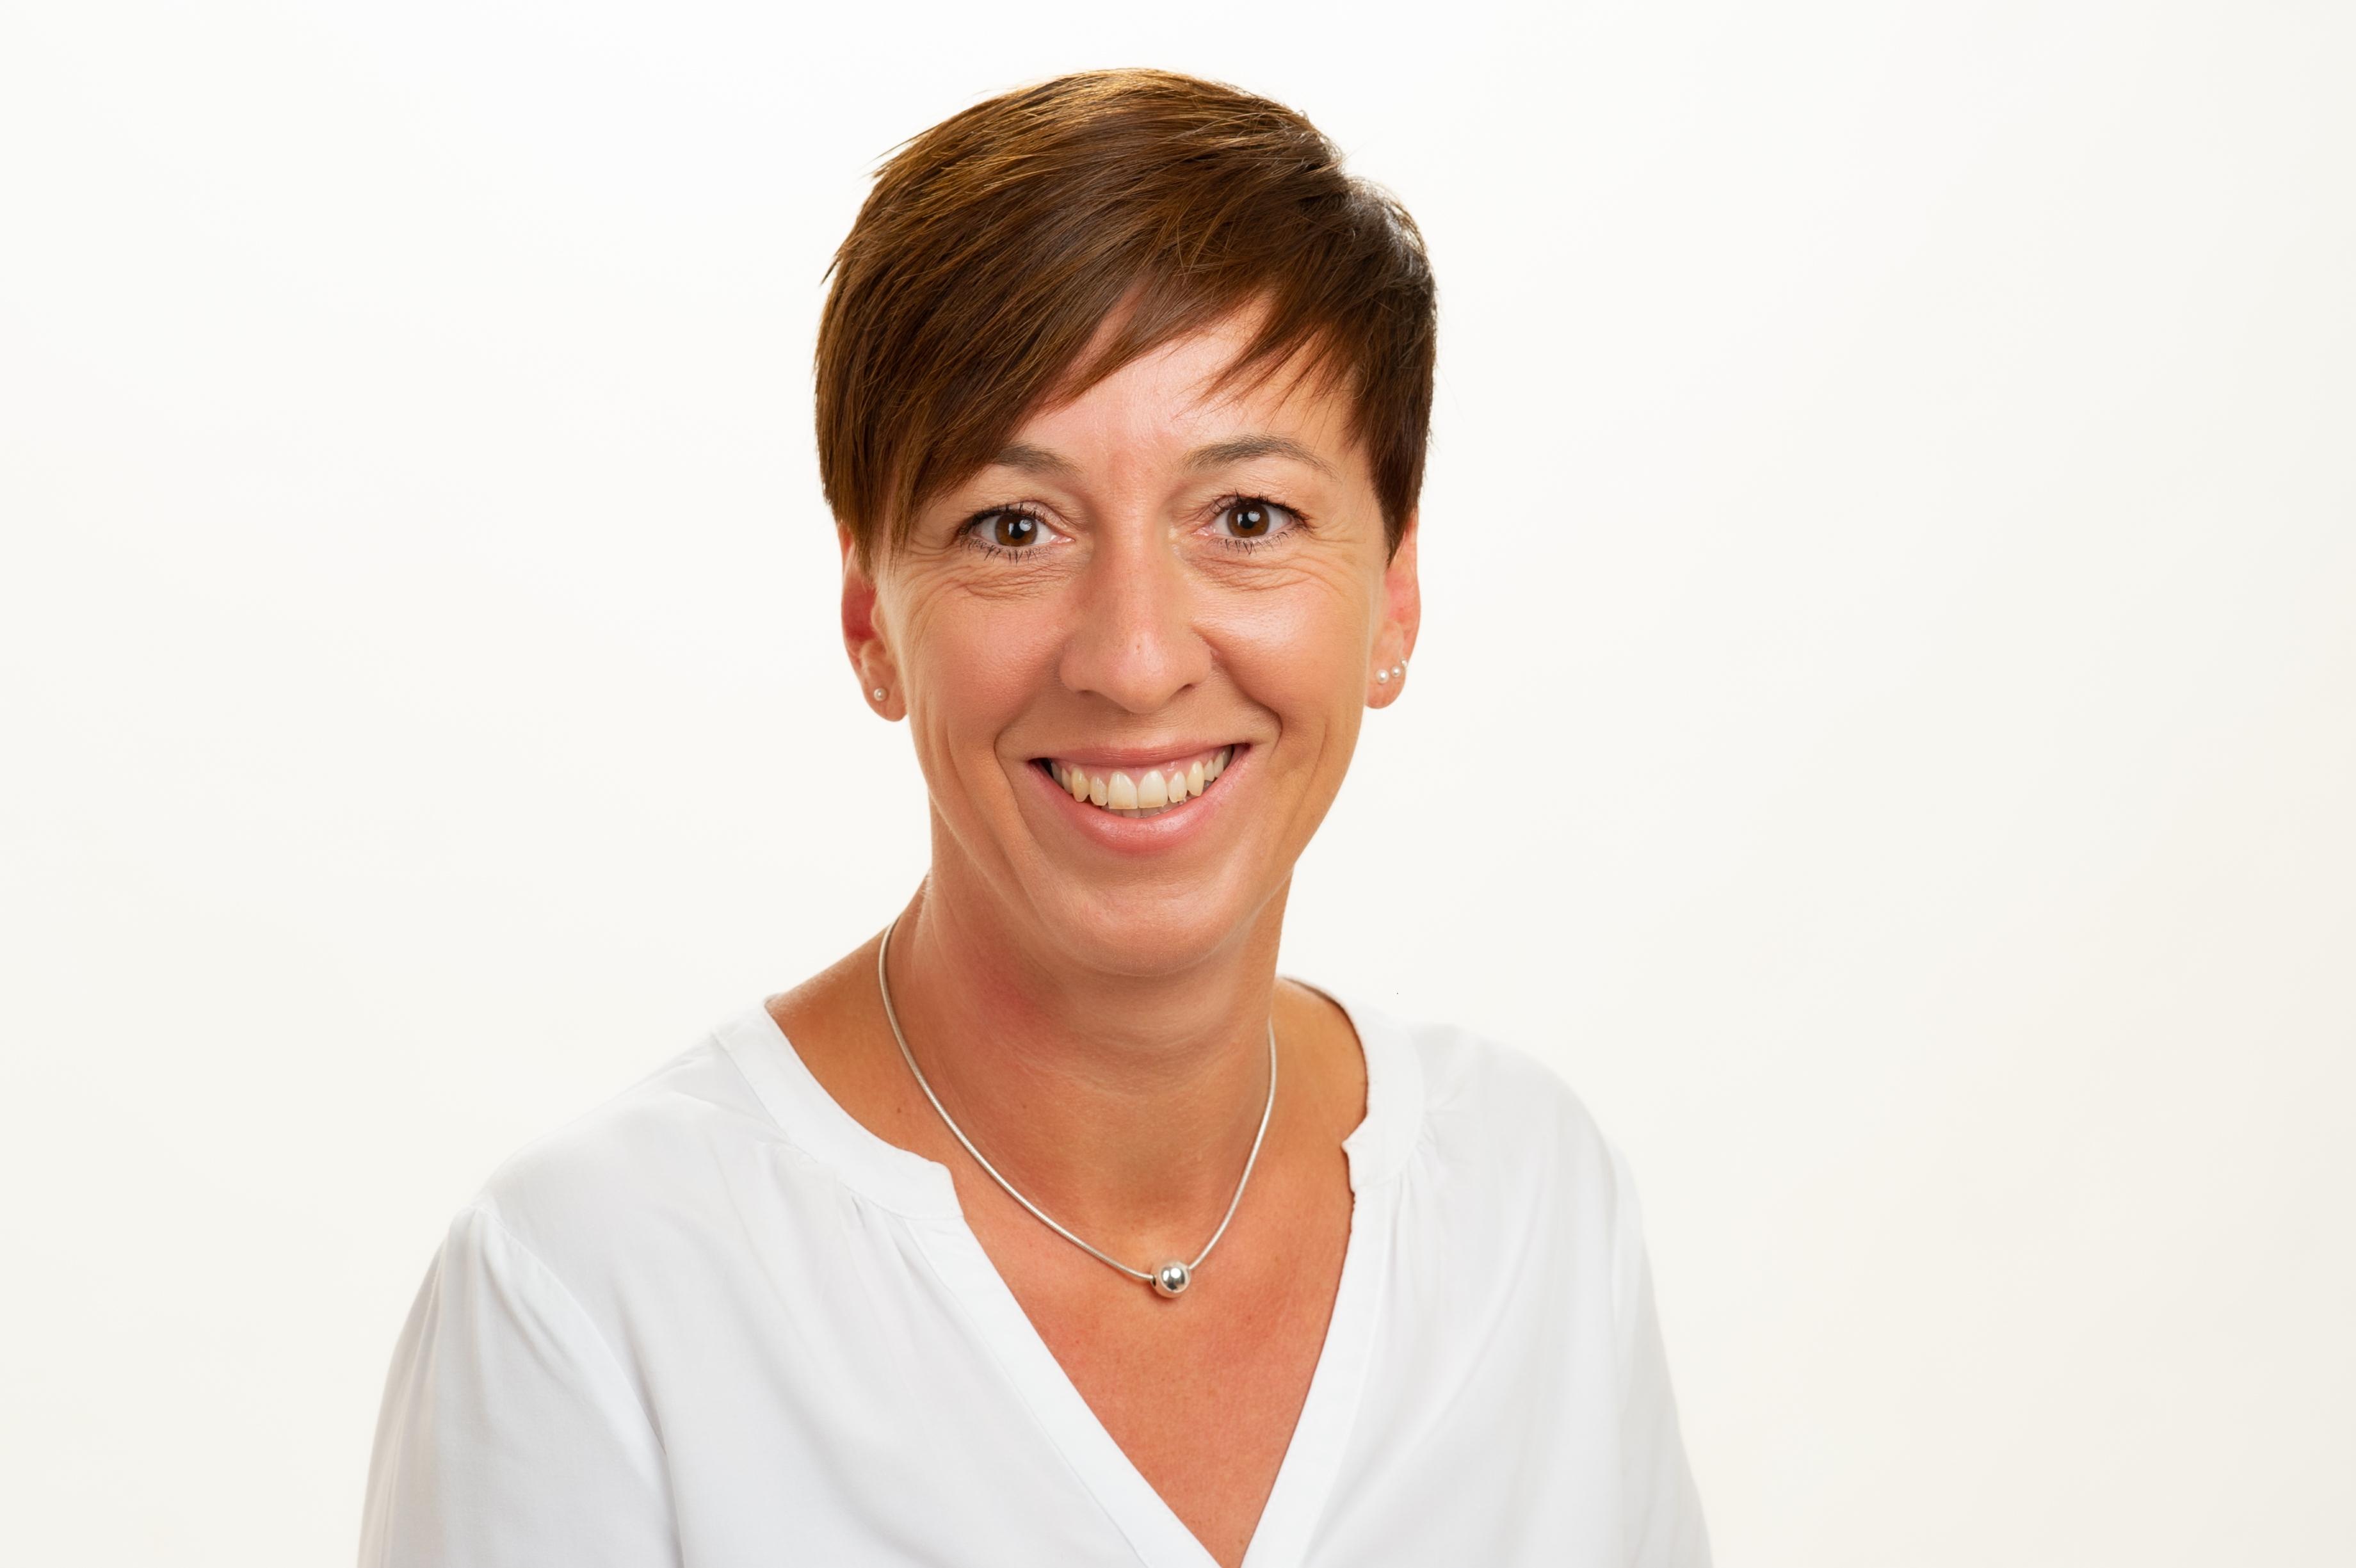 Sonja Merazzi